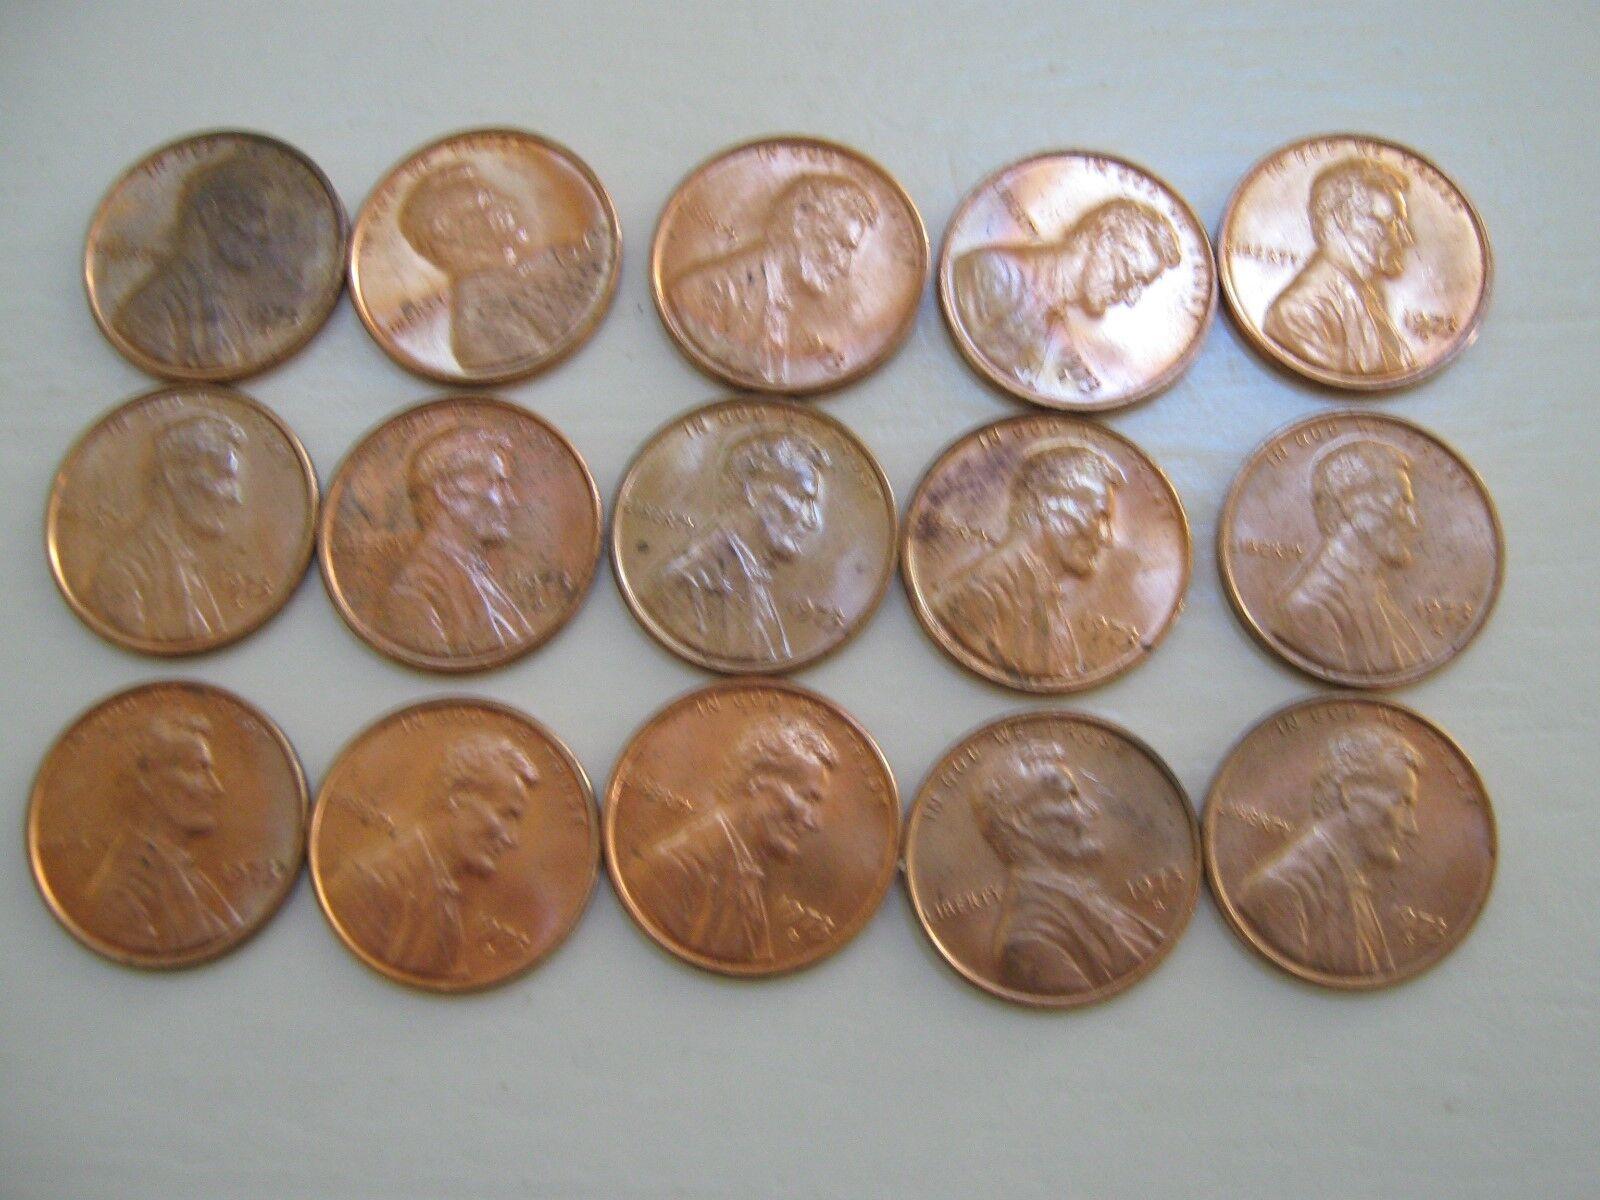 U.S. Mint , Mini Mint Bag , 15 Lincoln Cents , 1973 P-D